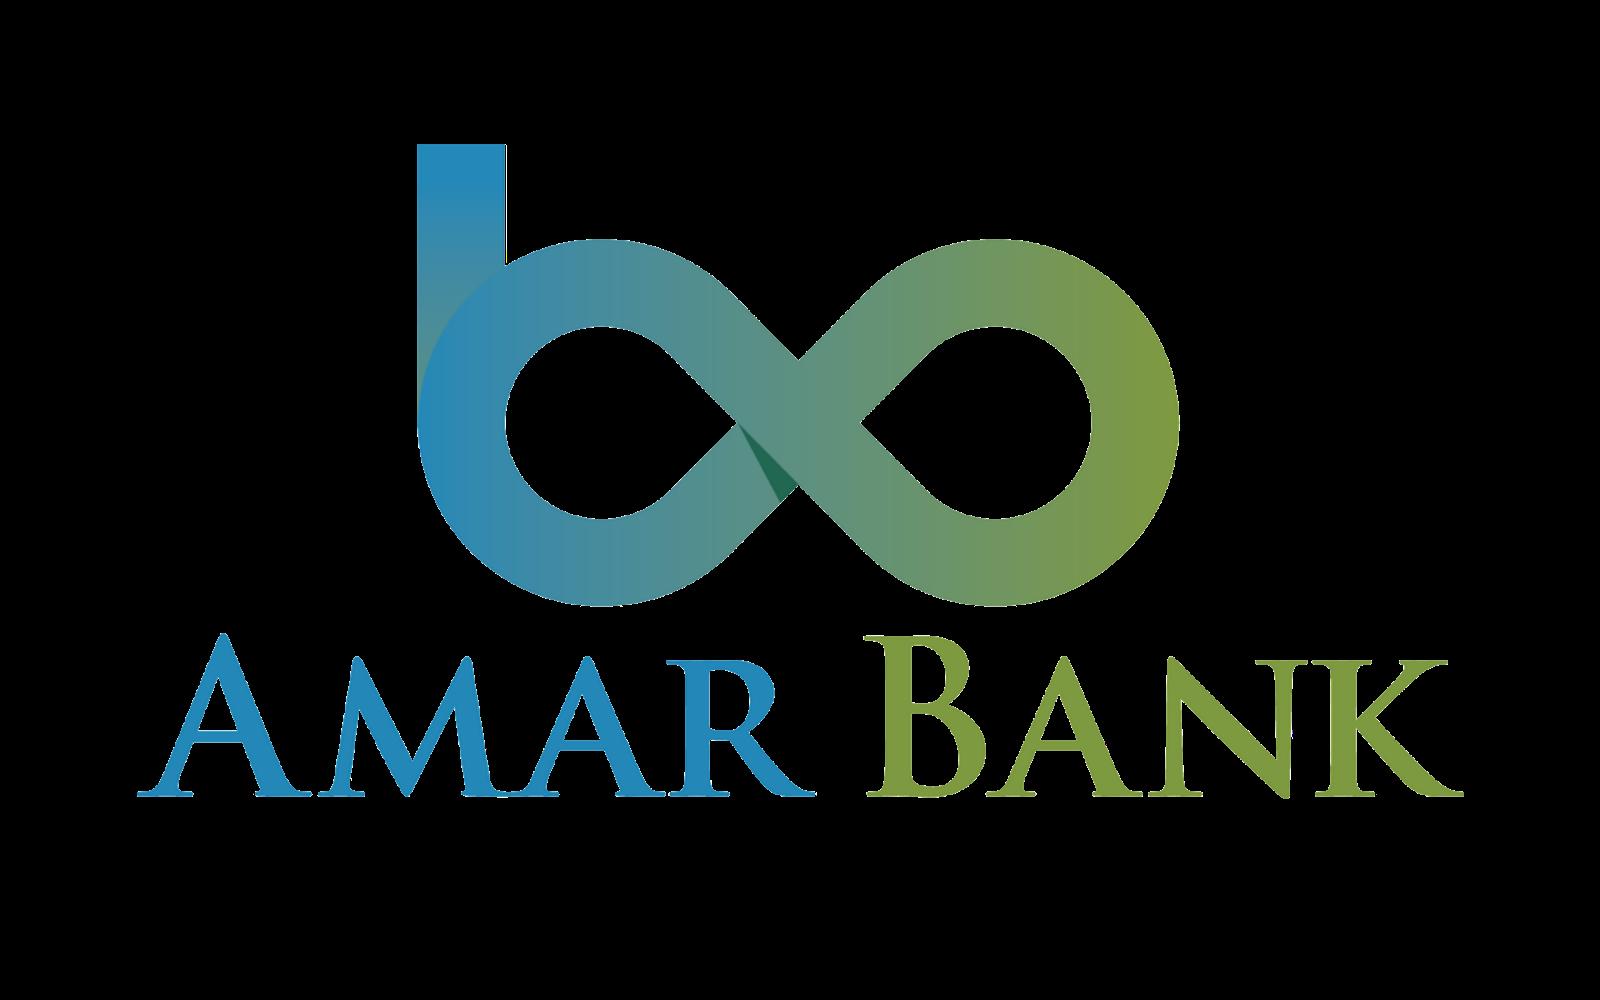 Logo Amar Bank Format PNG